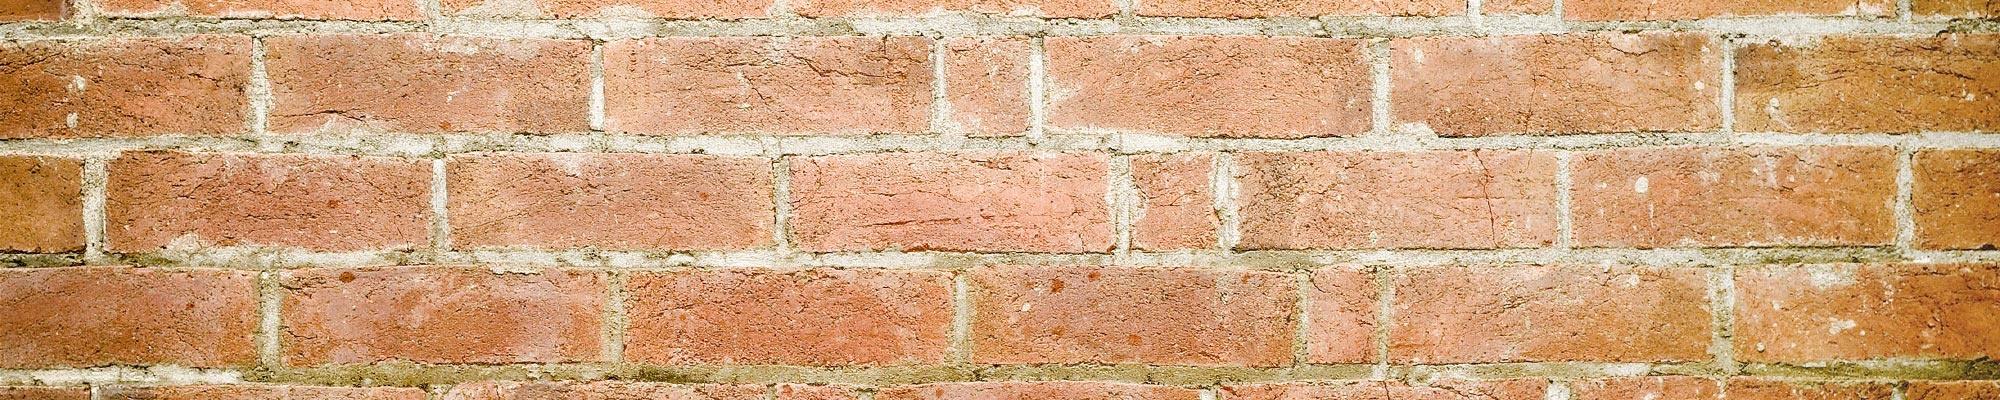 brickhousepod Cover